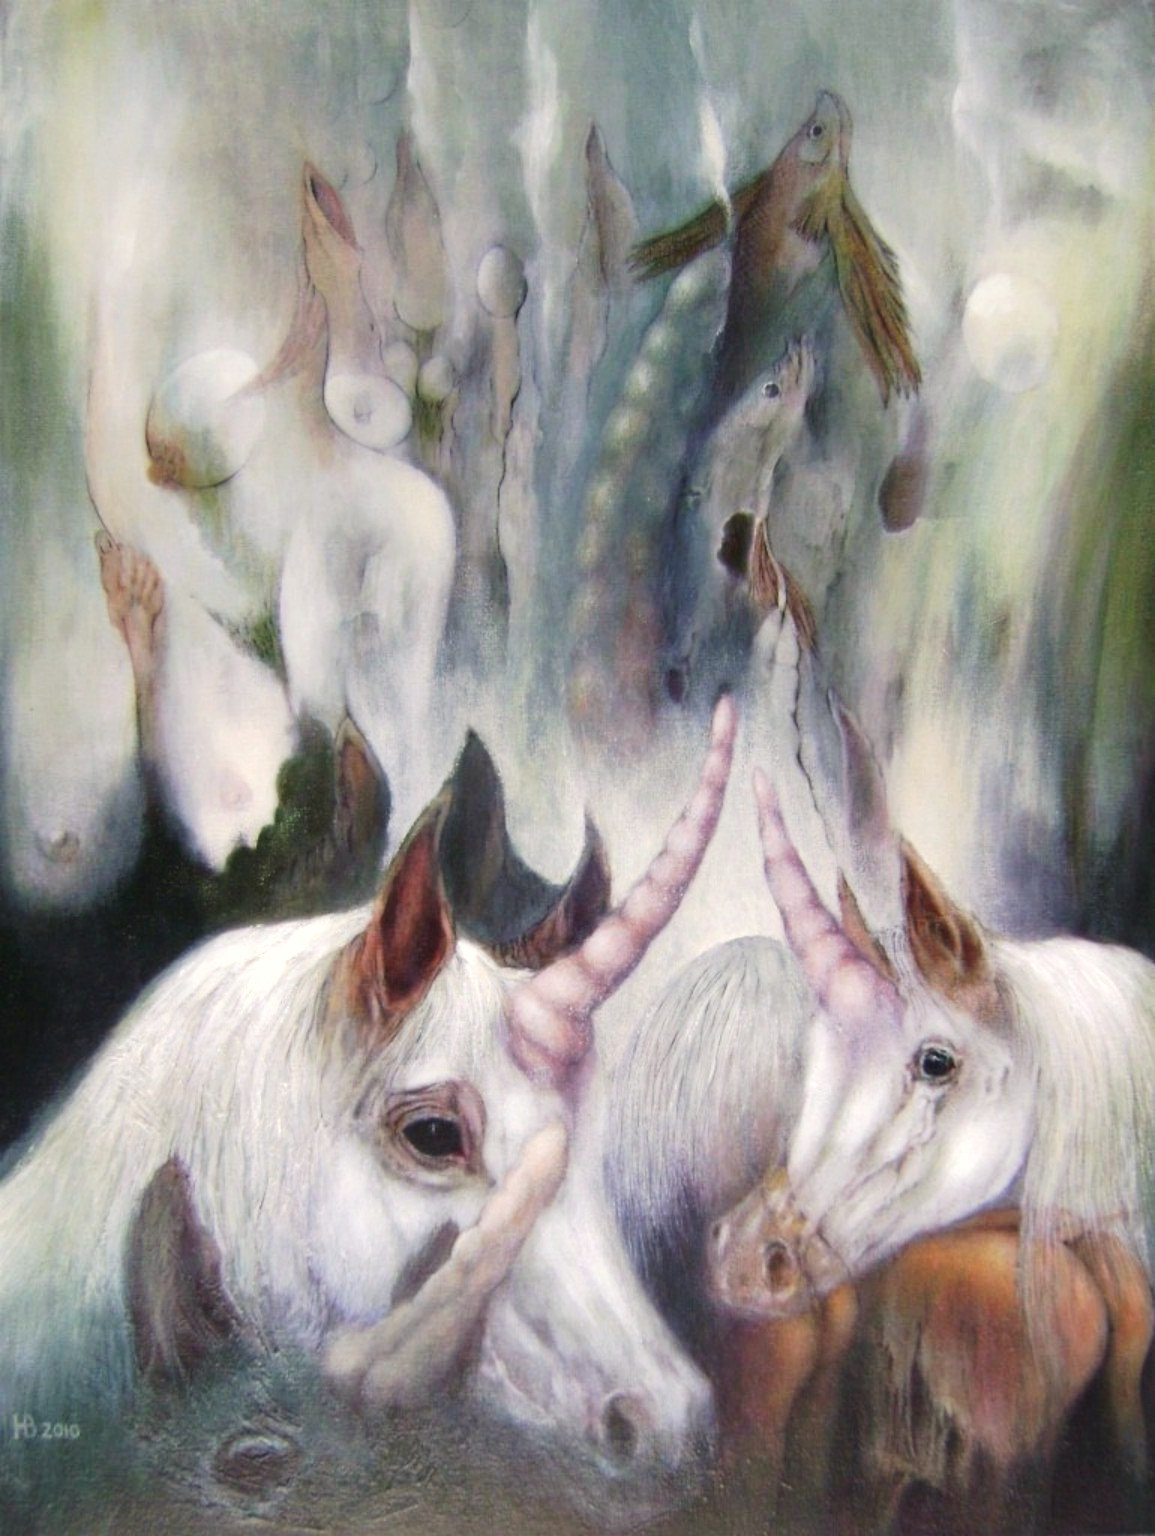 Unicorni, 80x60 cm, oil on canvas, 2010.